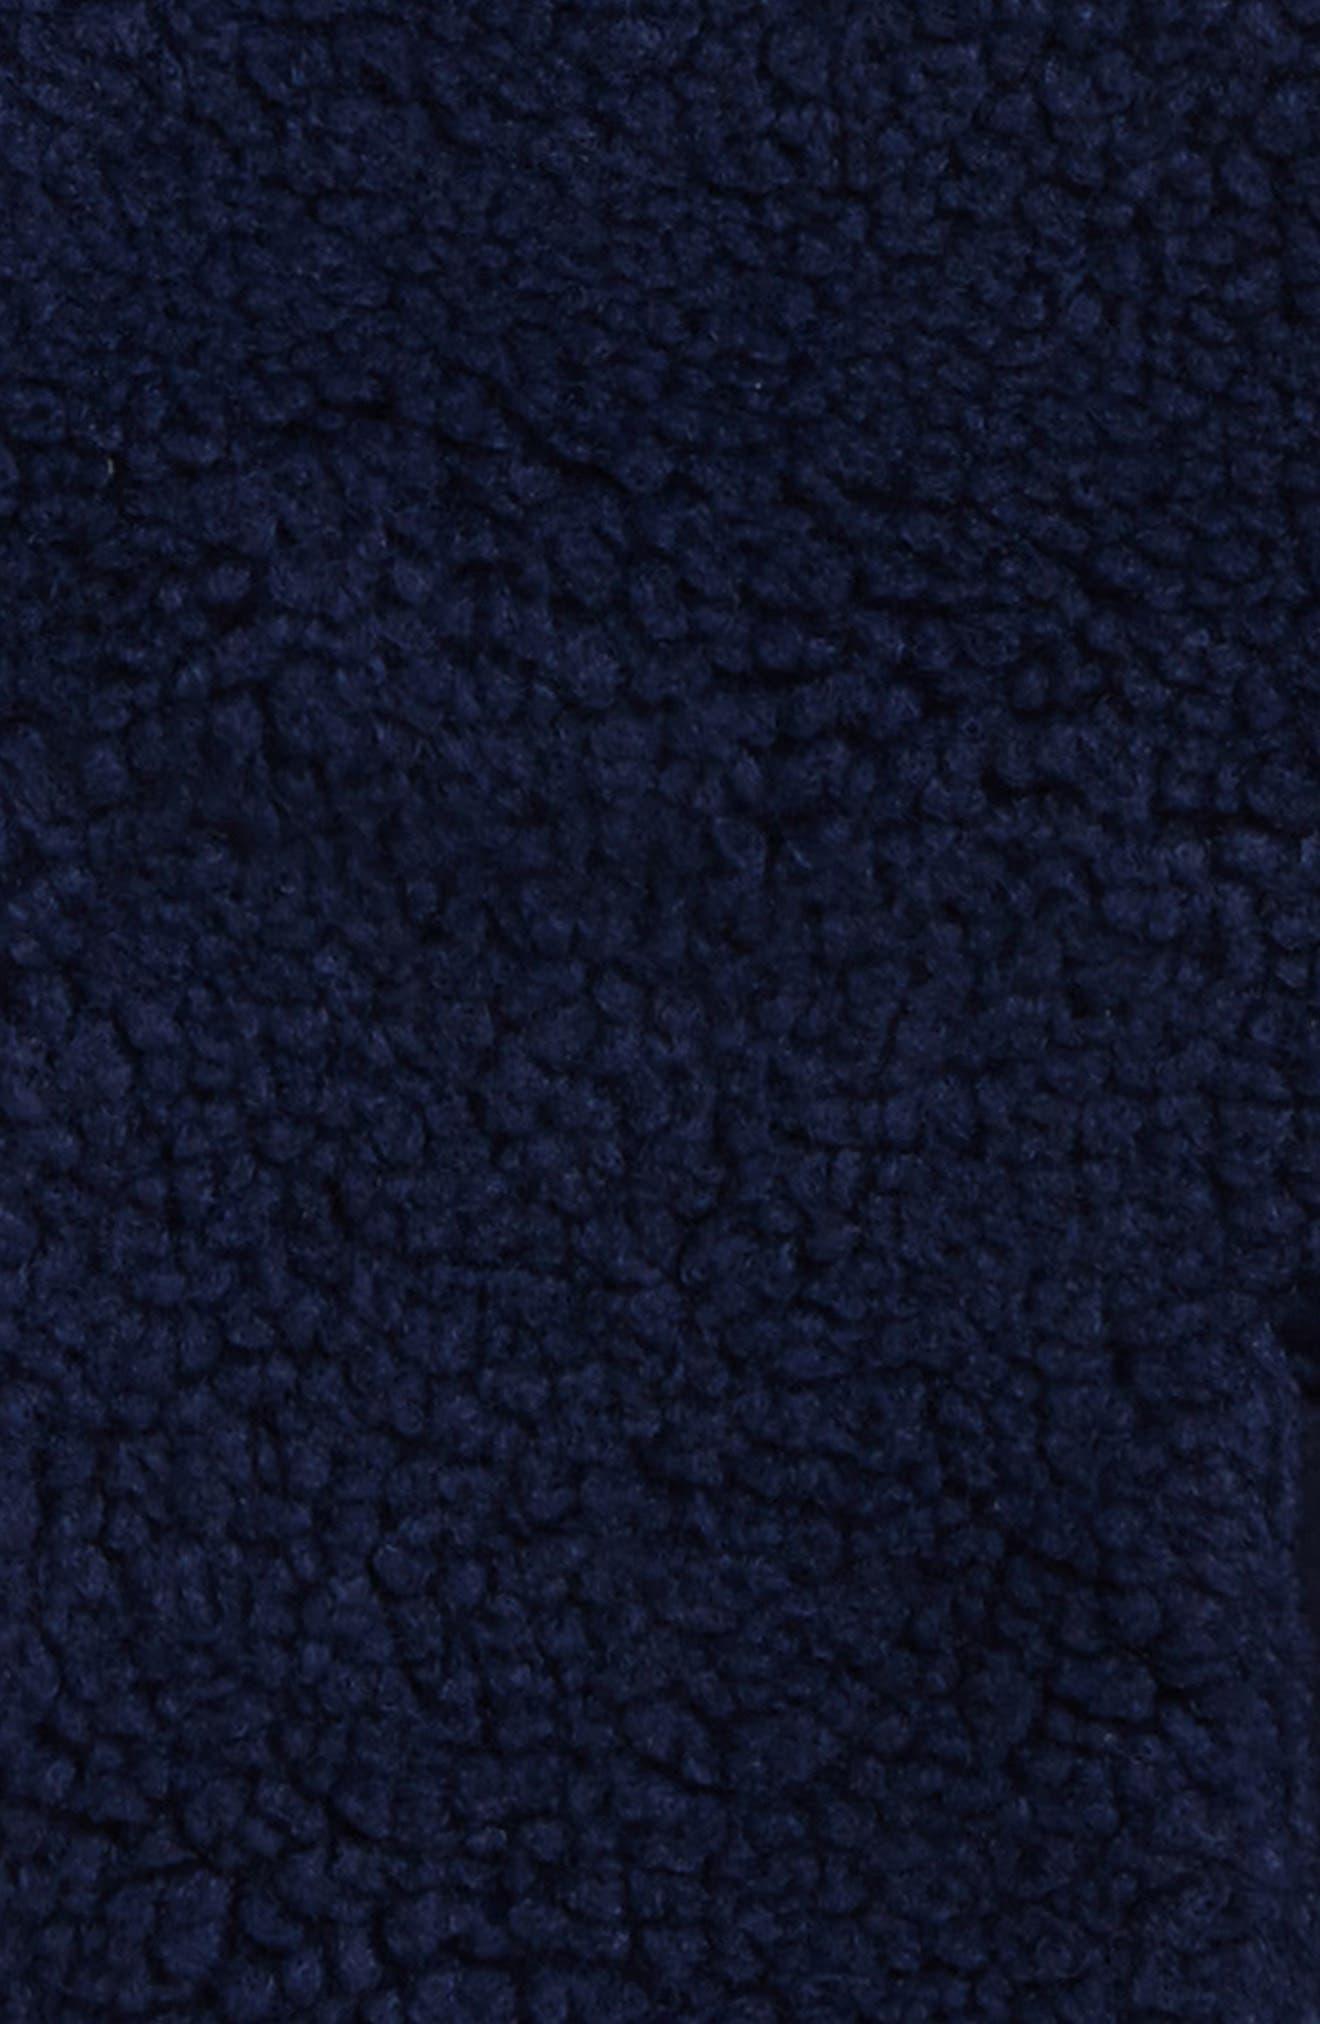 Fleece Zip Vest,                             Alternate thumbnail 2, color,                             400